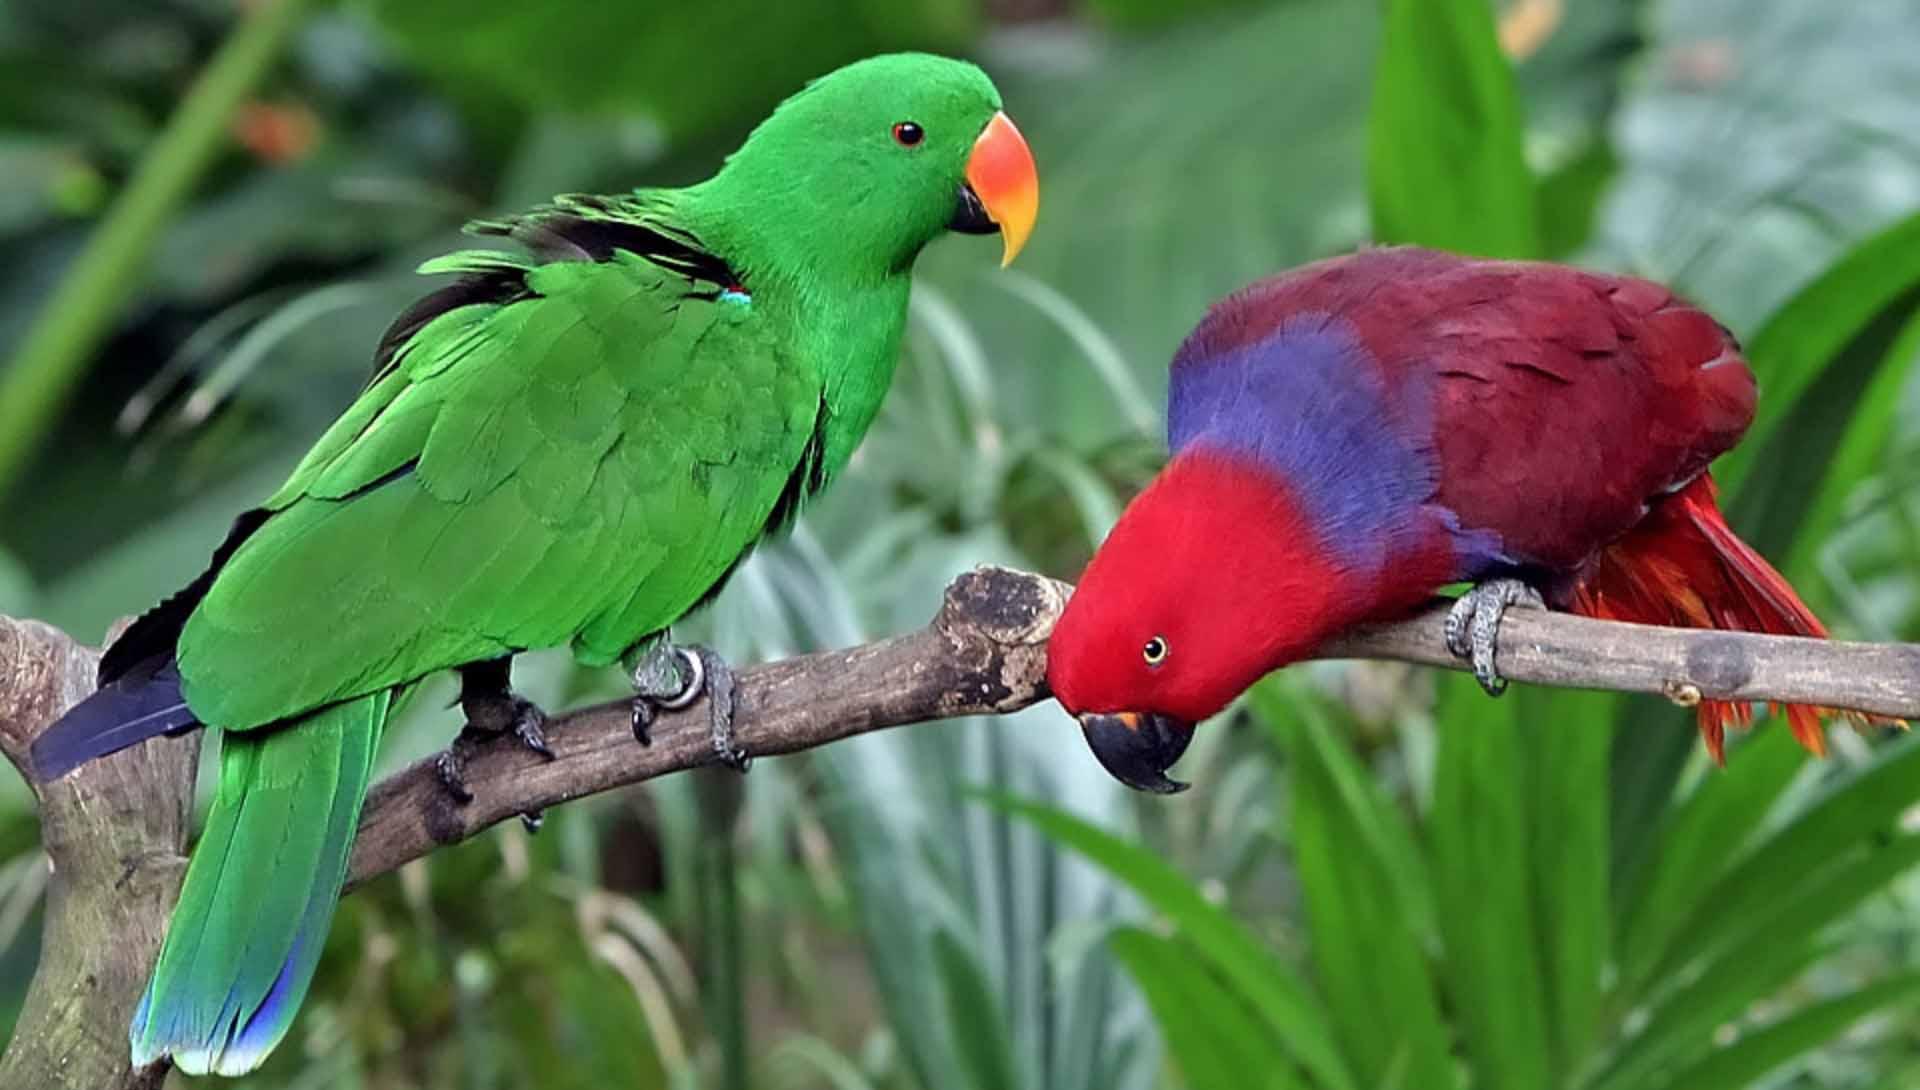 Harga Burung Nuri Bayan